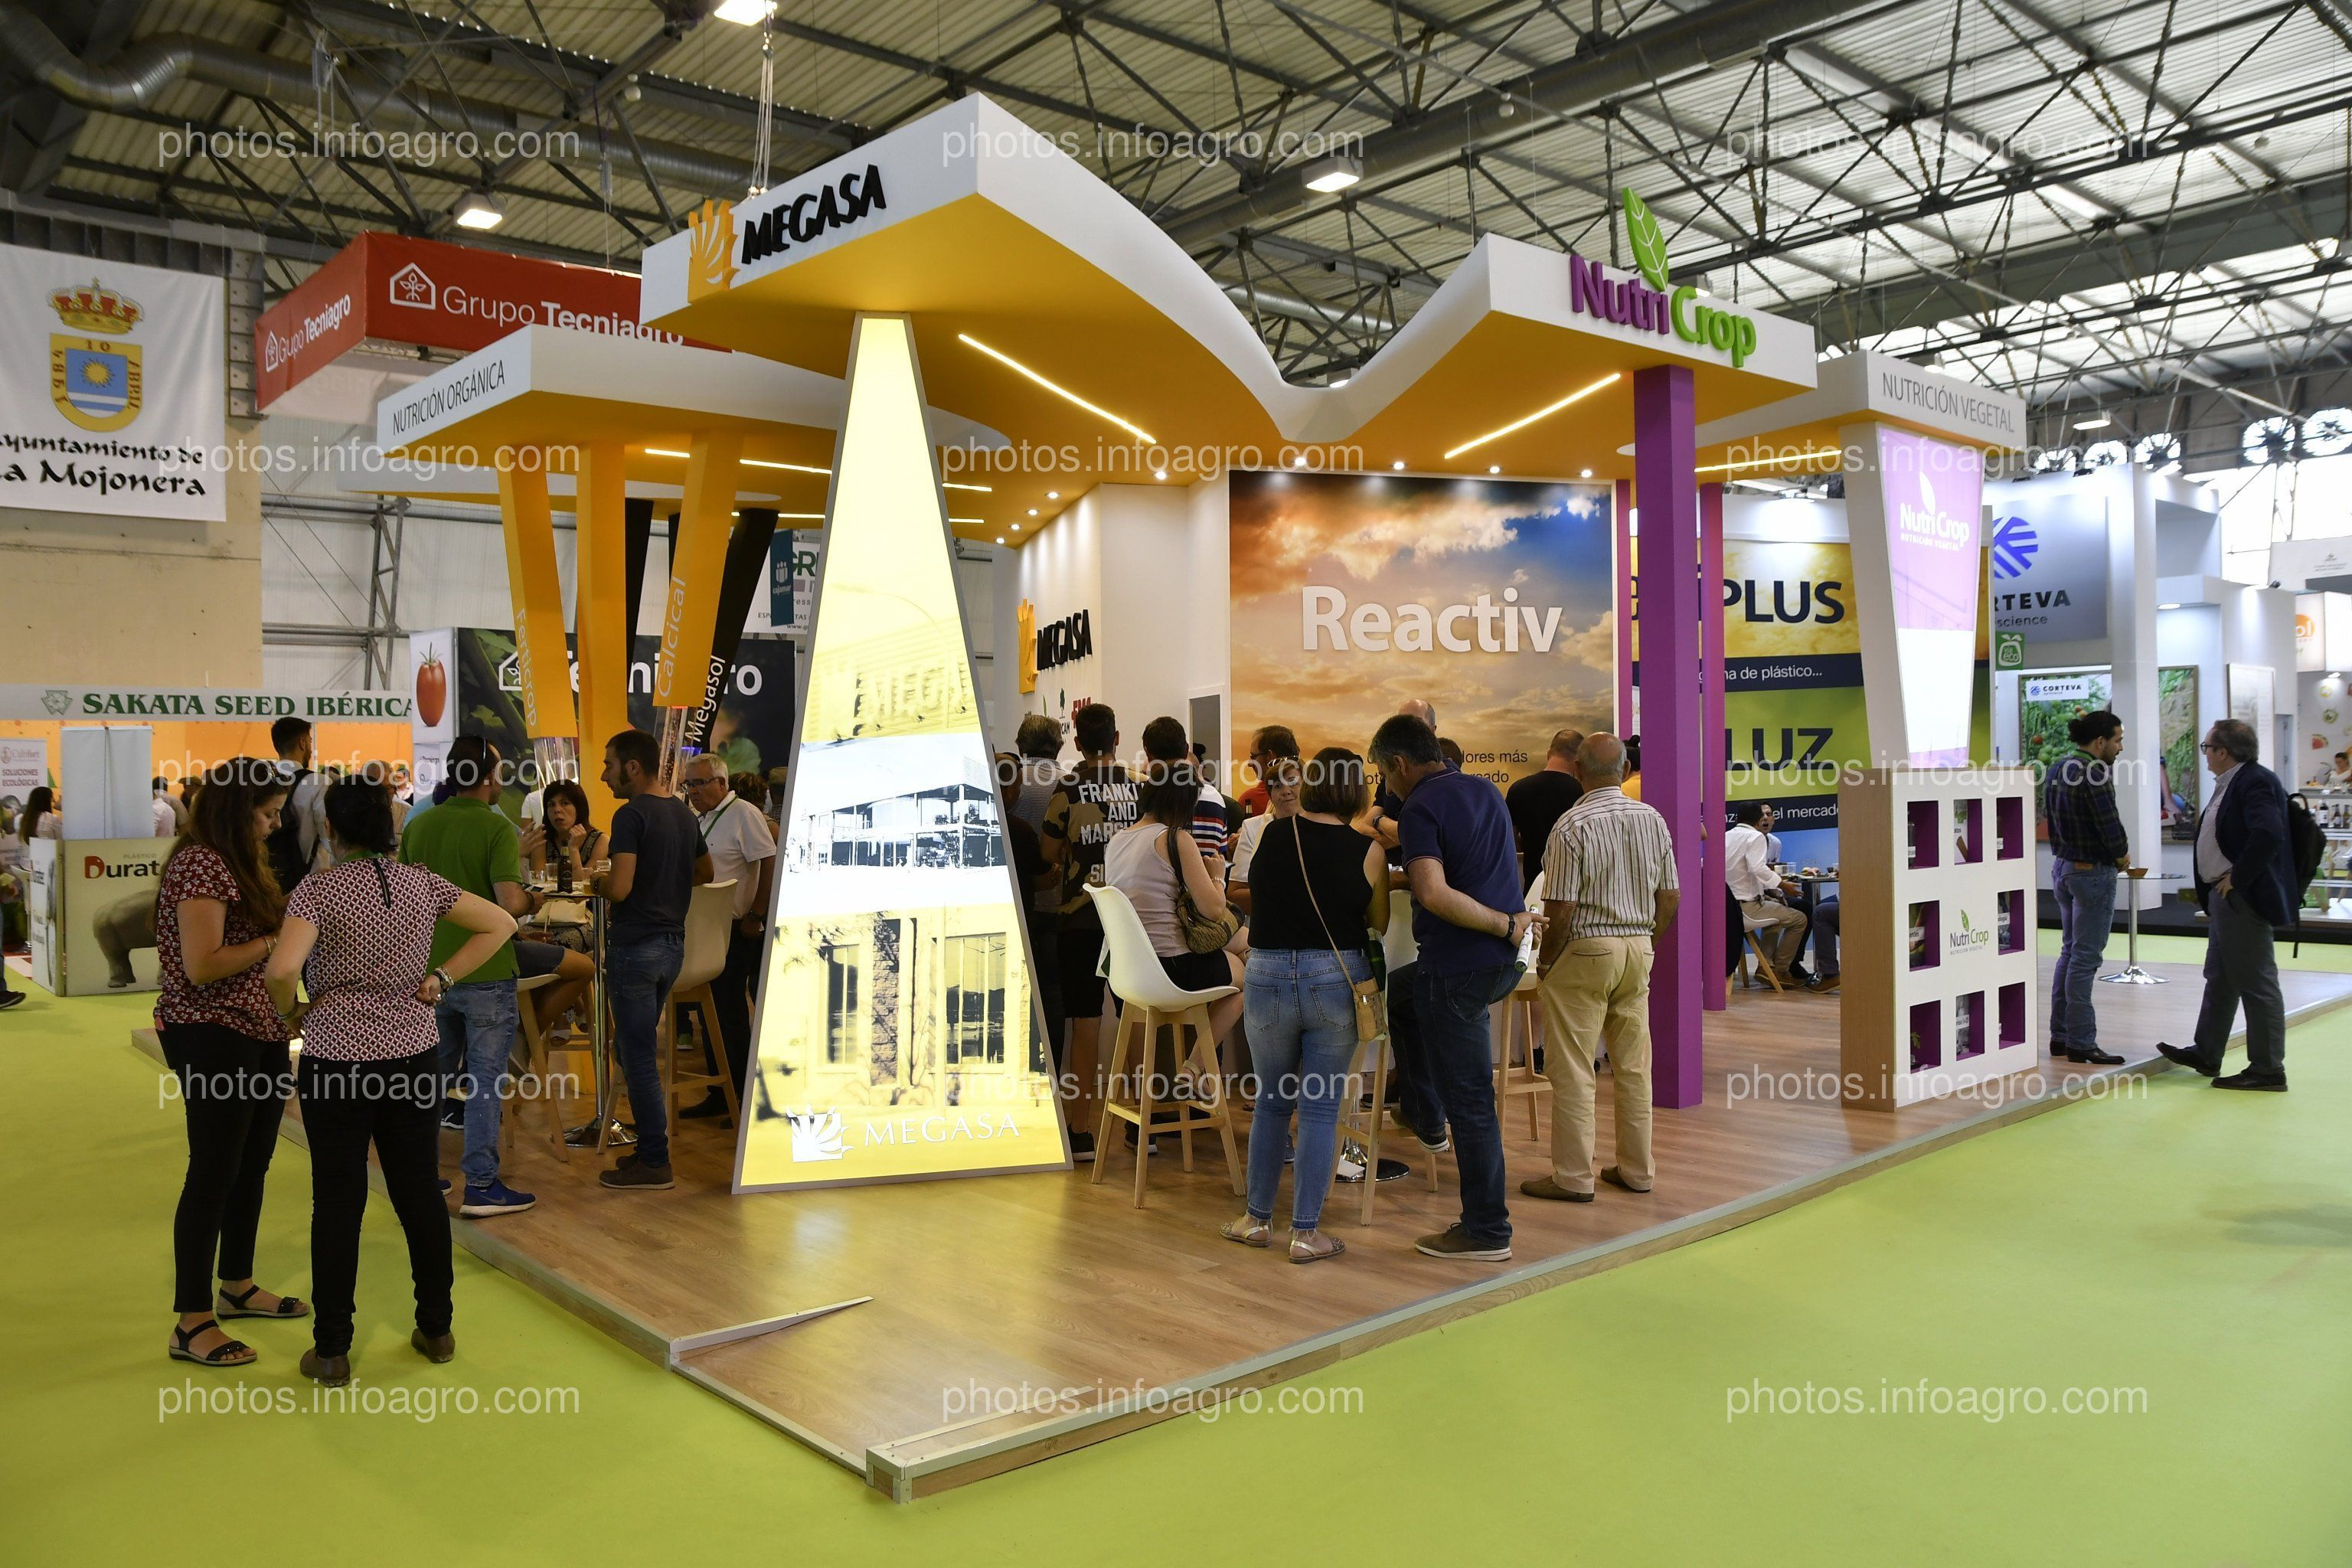 Megasa - Stand Infoagro Exhibition